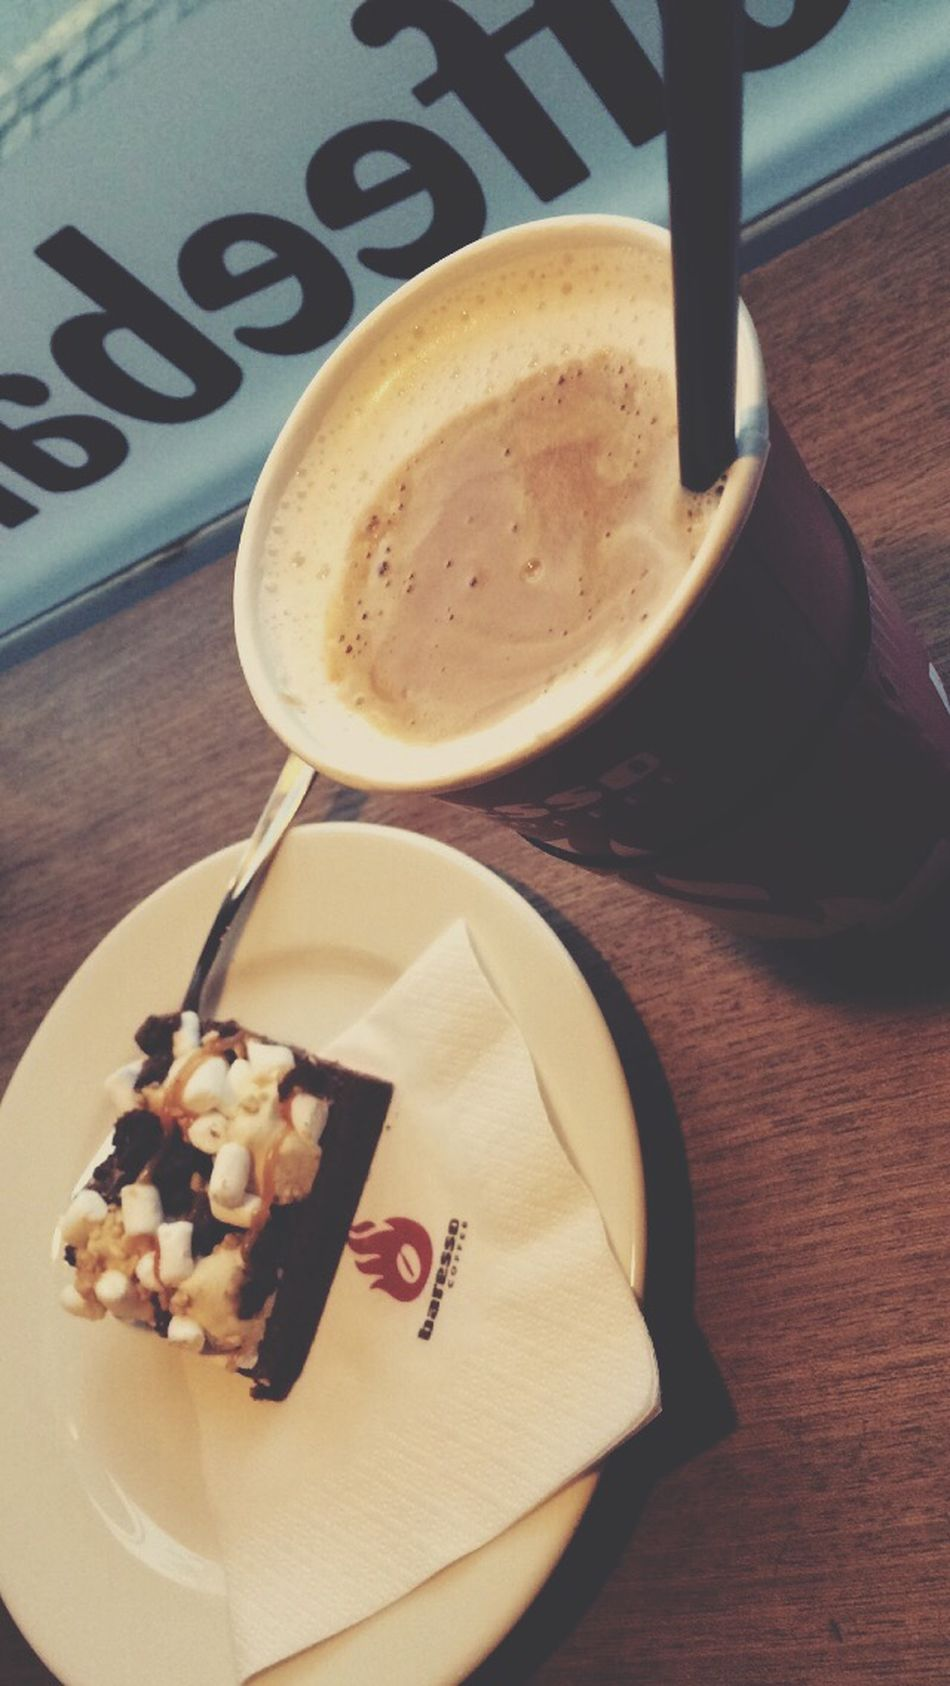 Brownies Salted Caramel Latte The Best Coffe Ever Baresso Copenhagen Relaxing Some Sweet Denmark Wintertime